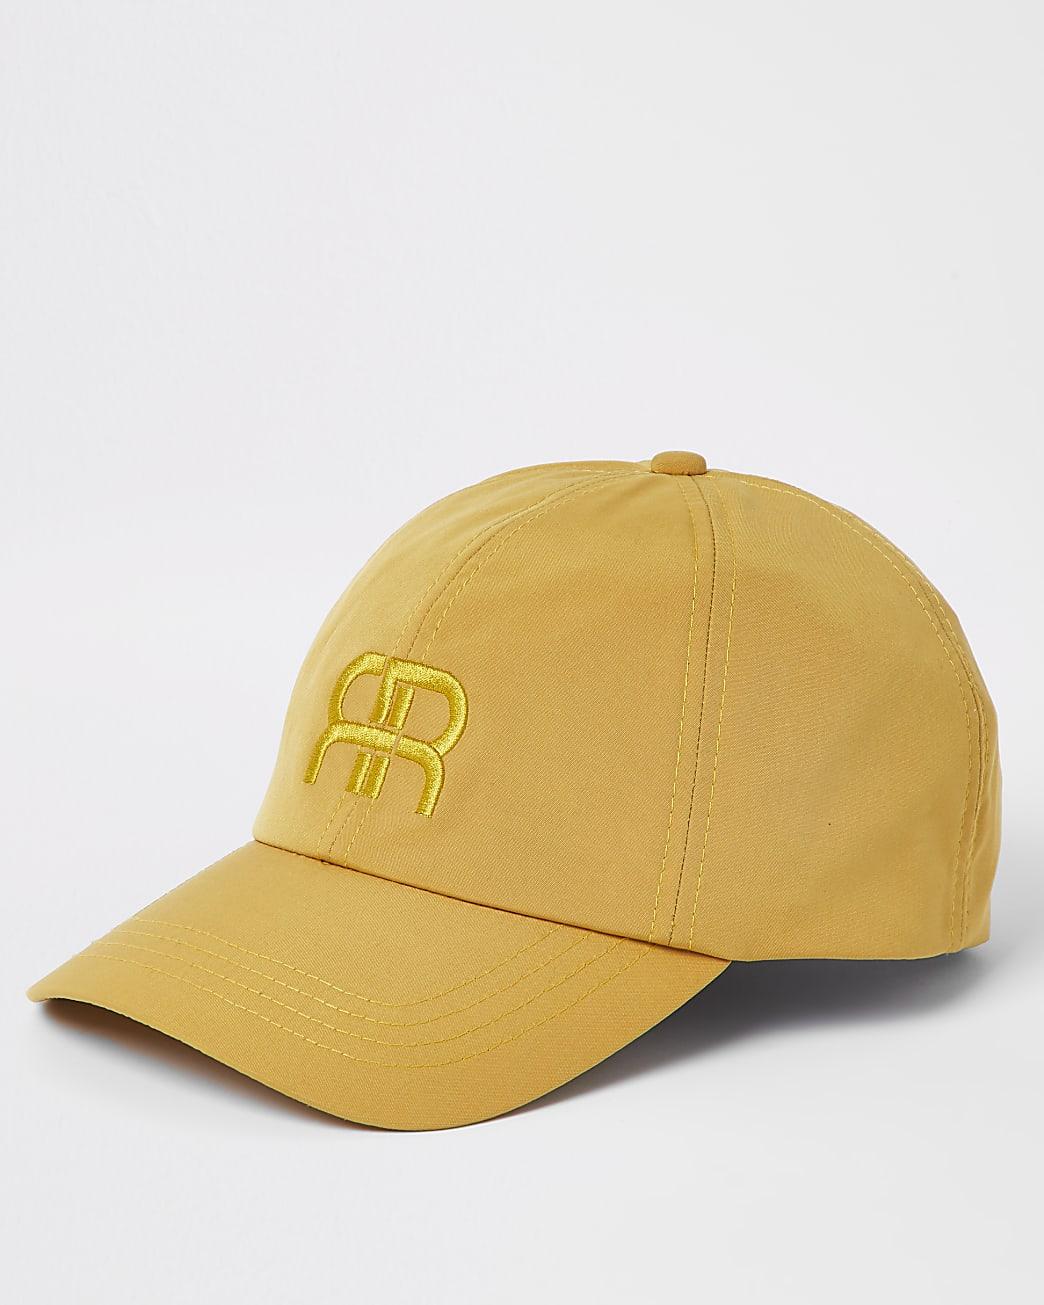 Yellow RR cap